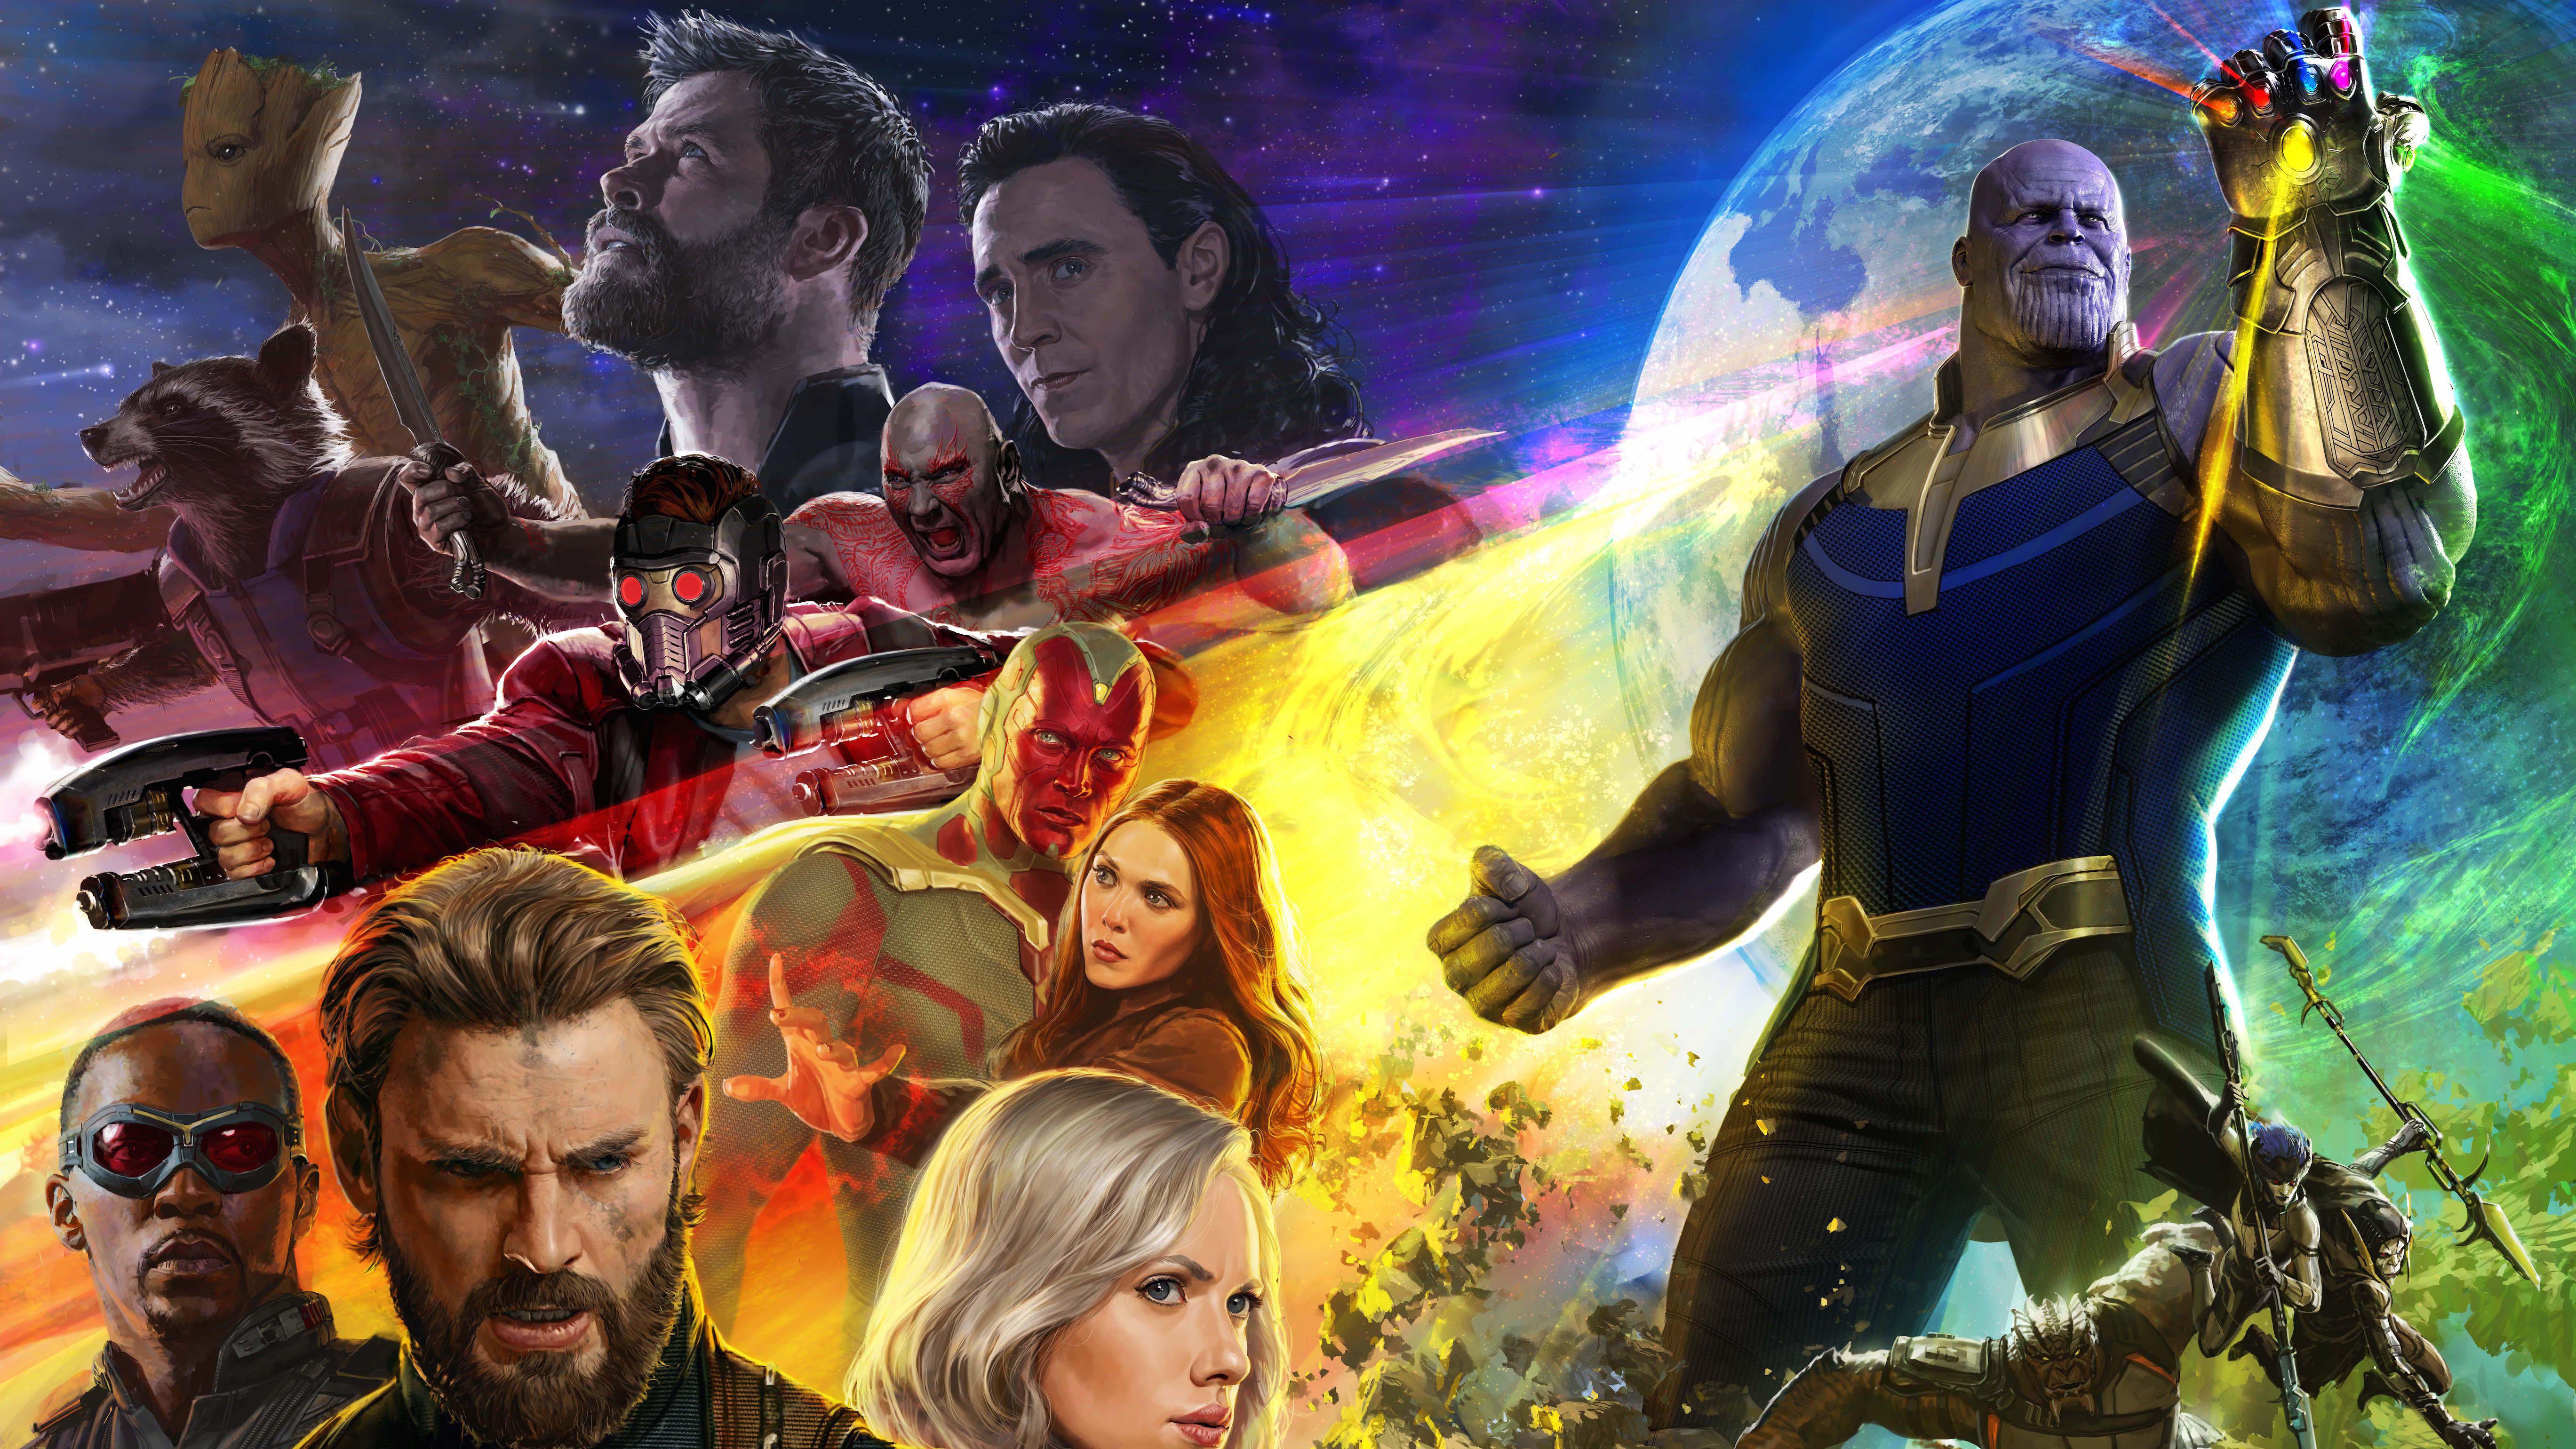 Must see Vision Wanda Infinity War Wallpaper - 887224  Photograph_949617 .jpg